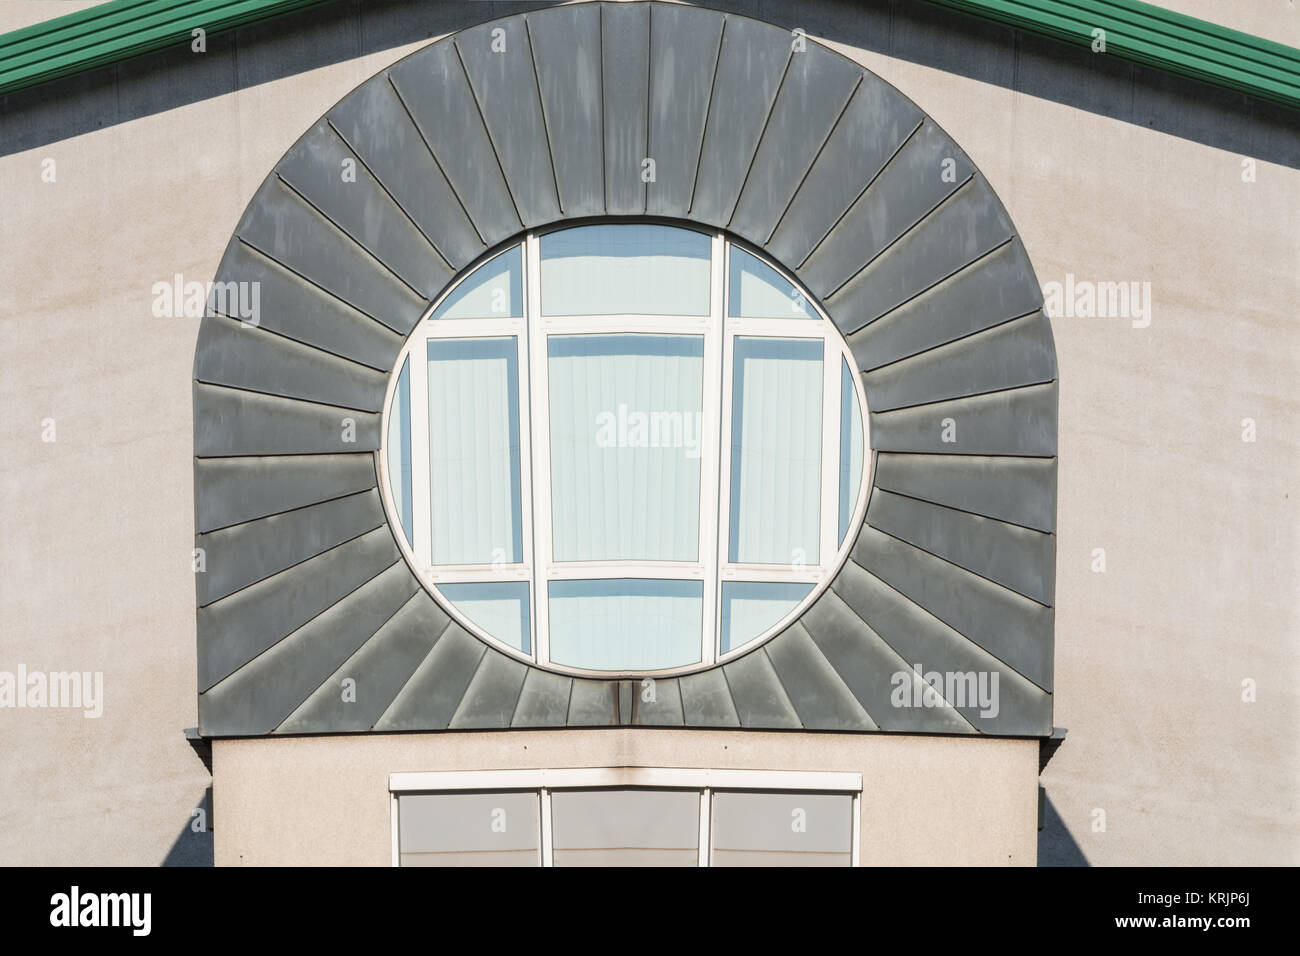 Dacheindeckung stock photos dacheindeckung stock images for Moderne fenster